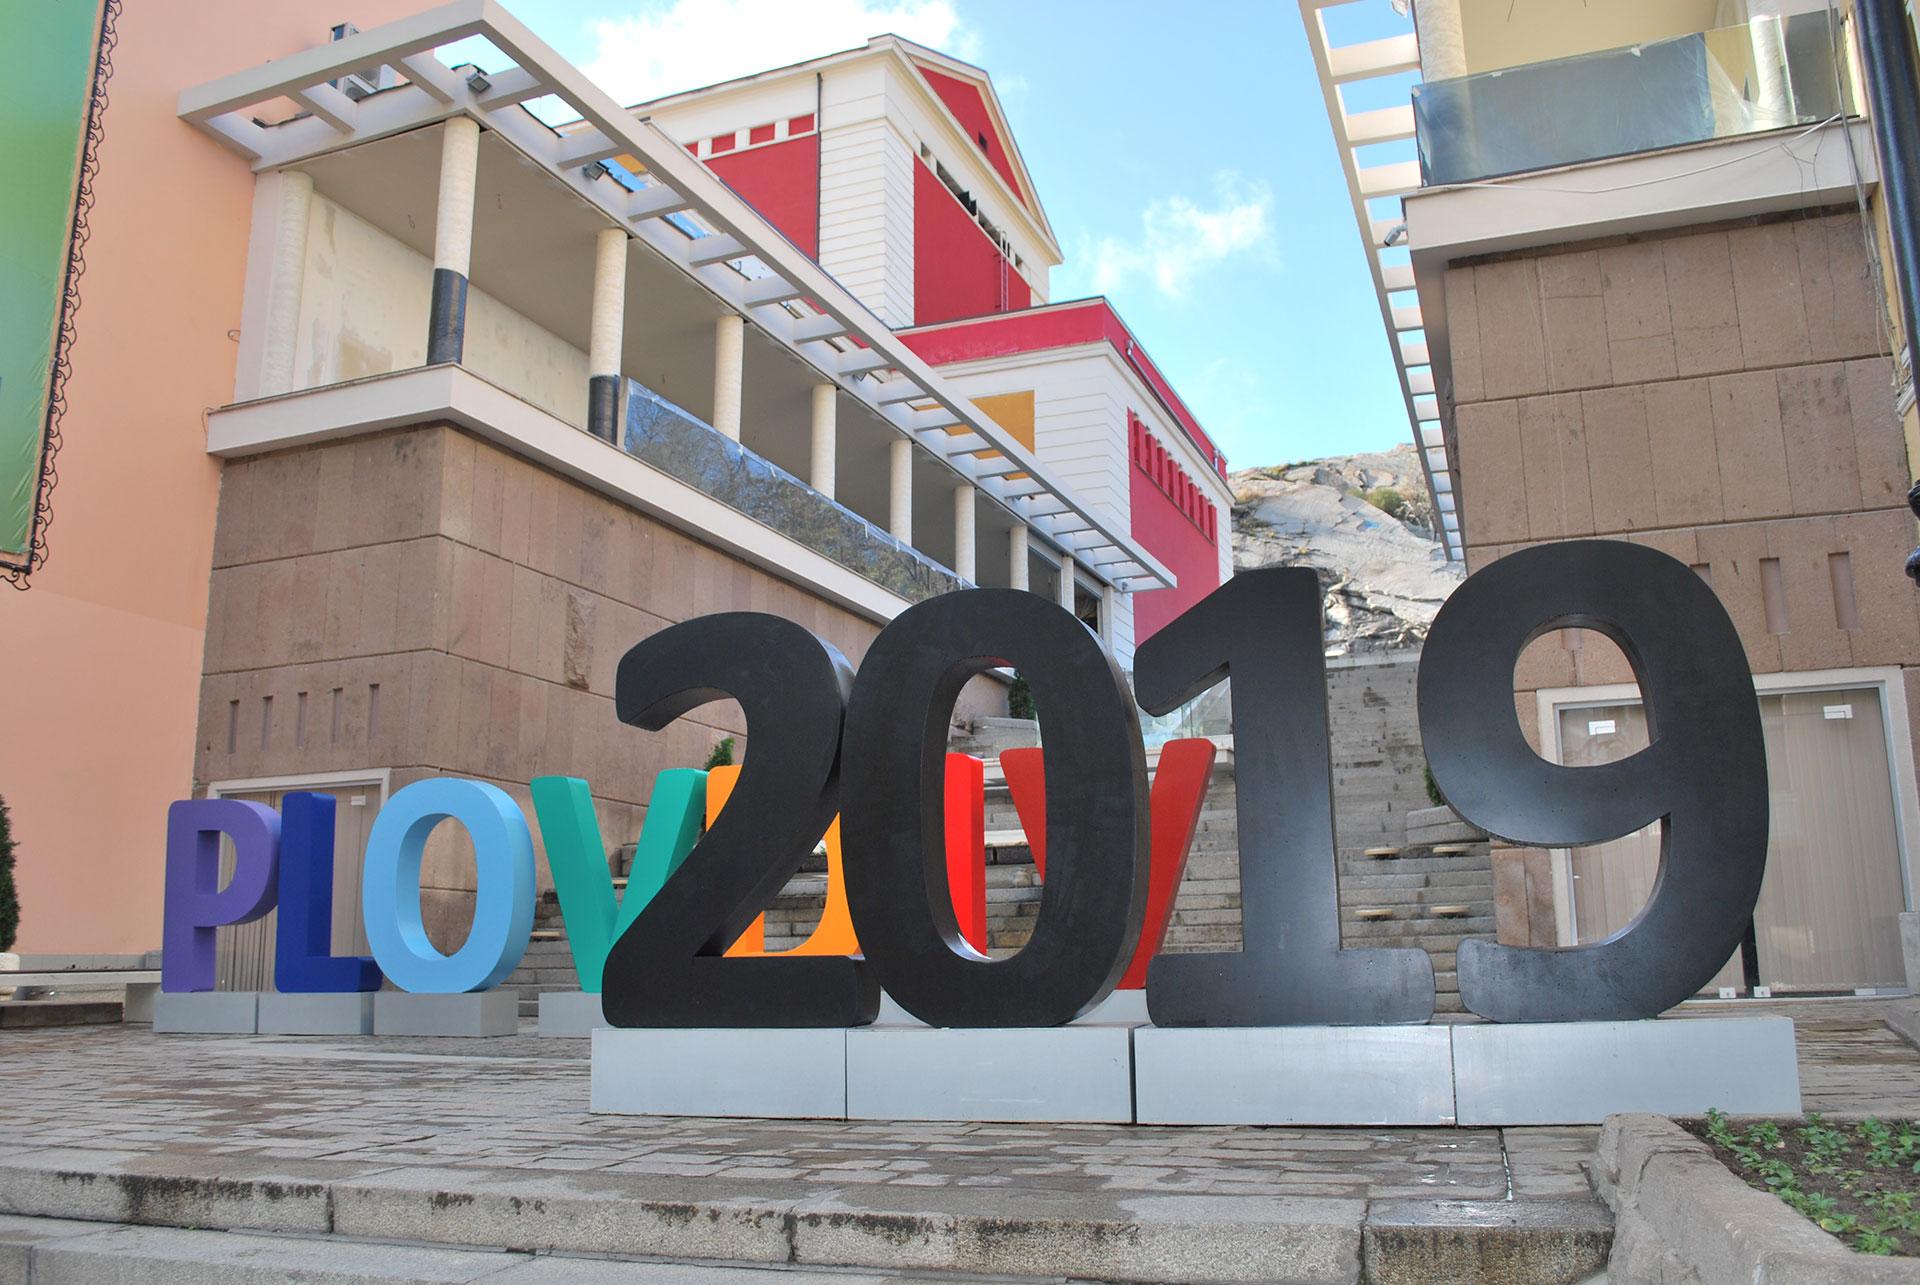 Plovdiv_CulturalCapital